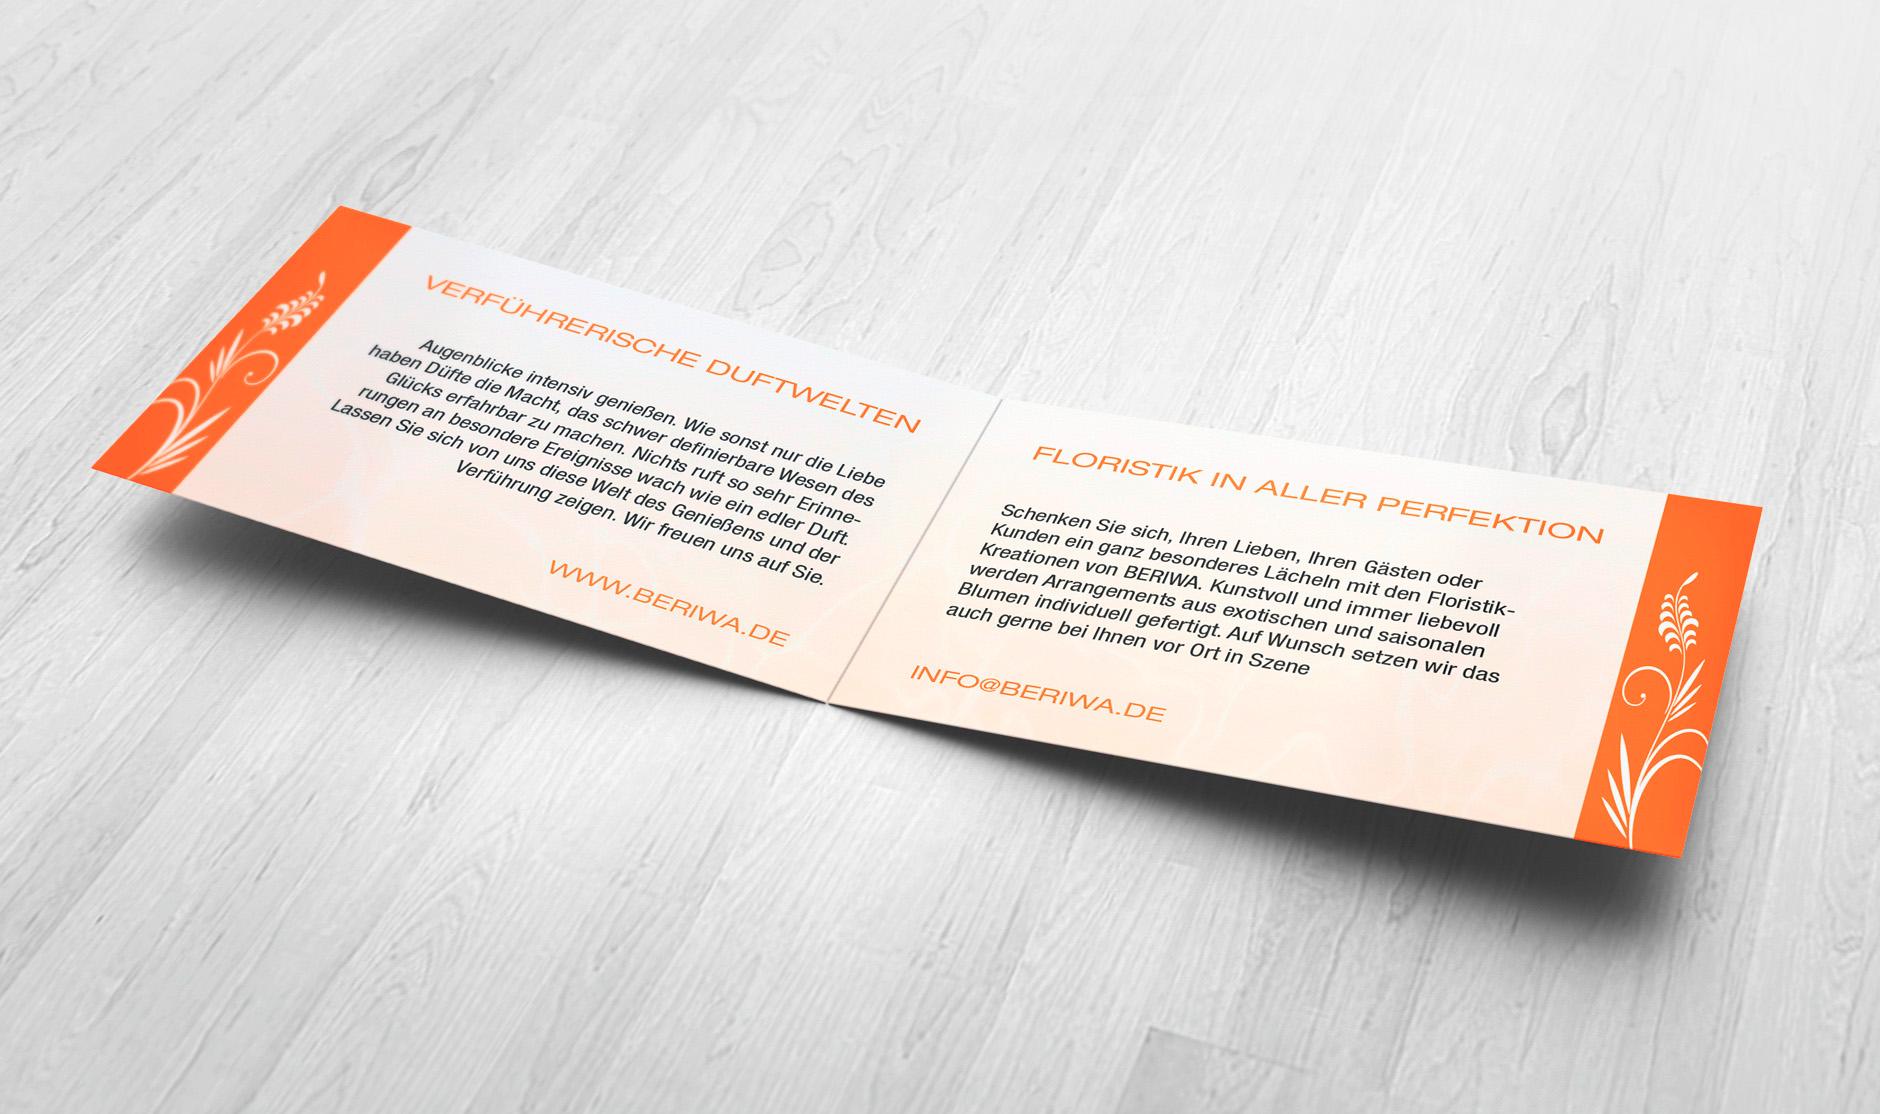 Beriwa visitenkarte innen-Printdesign - CI BERIWA